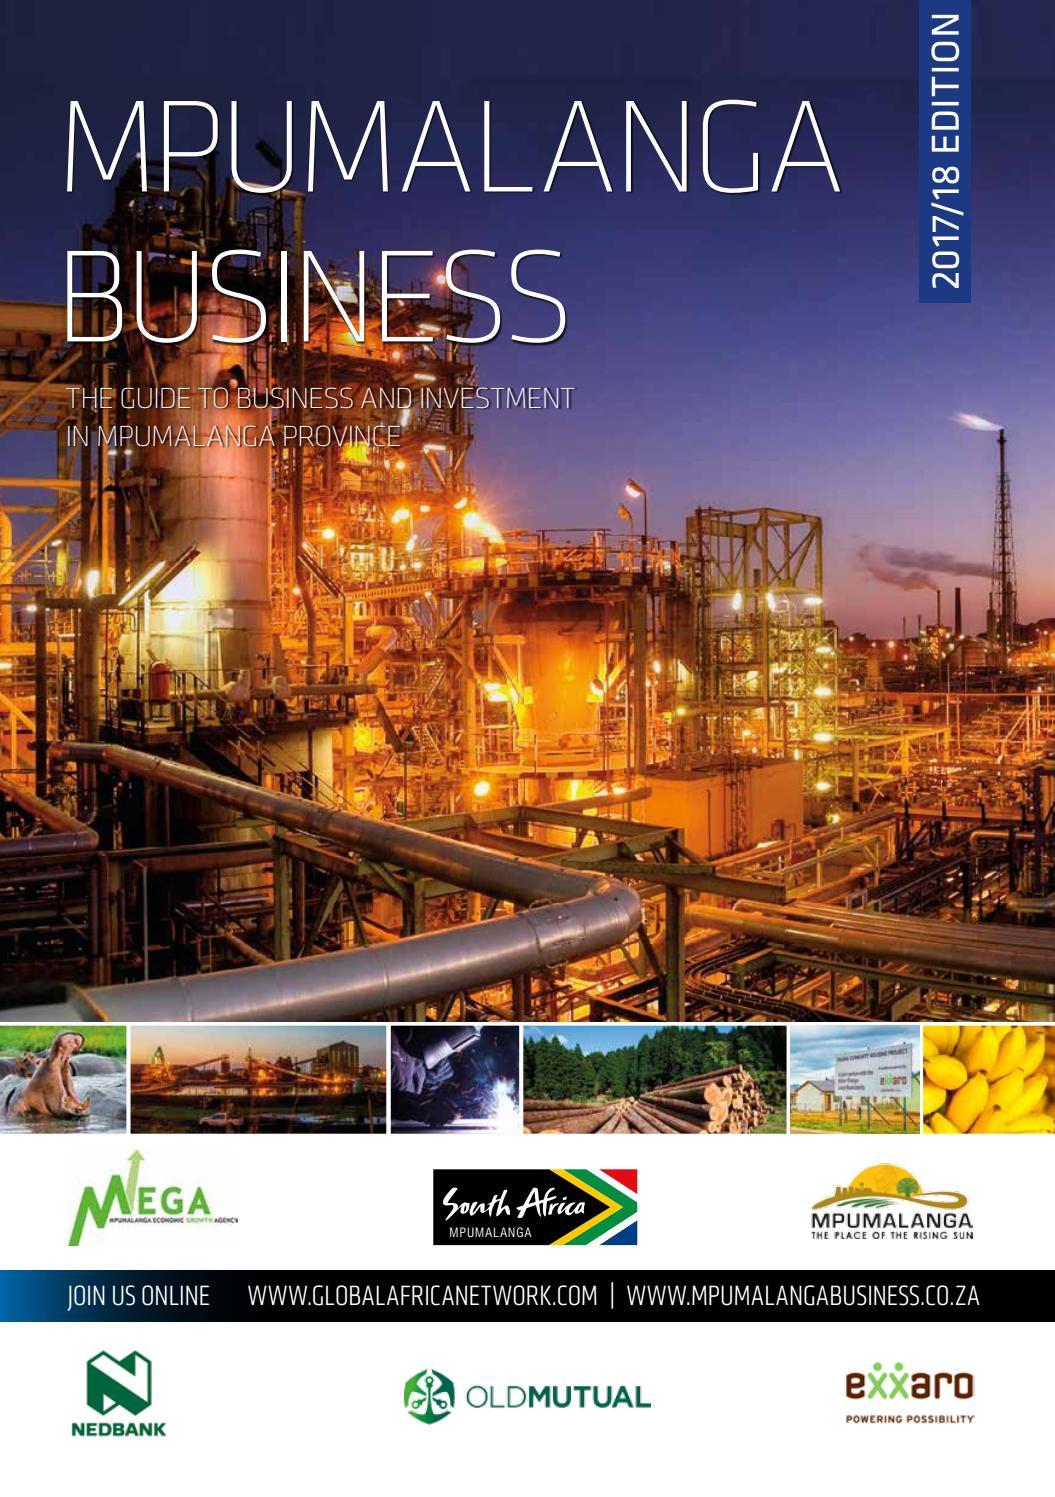 Mpumalanga Business 2017/18 by Global Africa Network - issuu